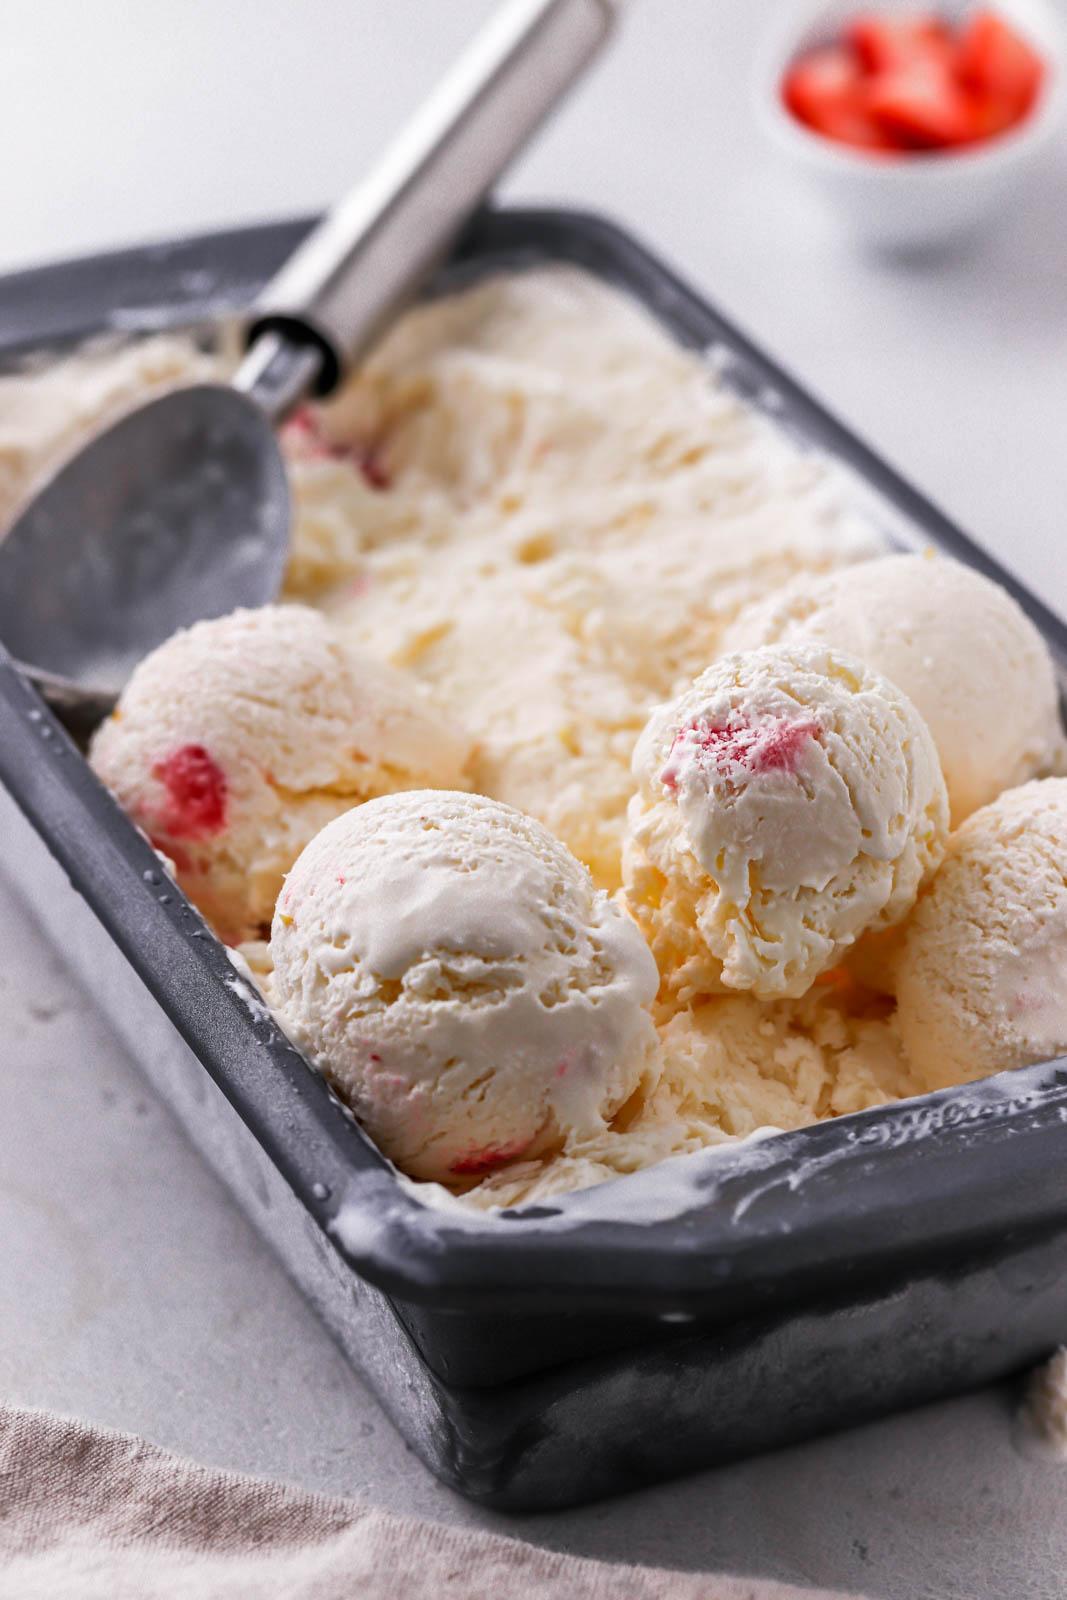 ice cream scoop in homemade ice cream